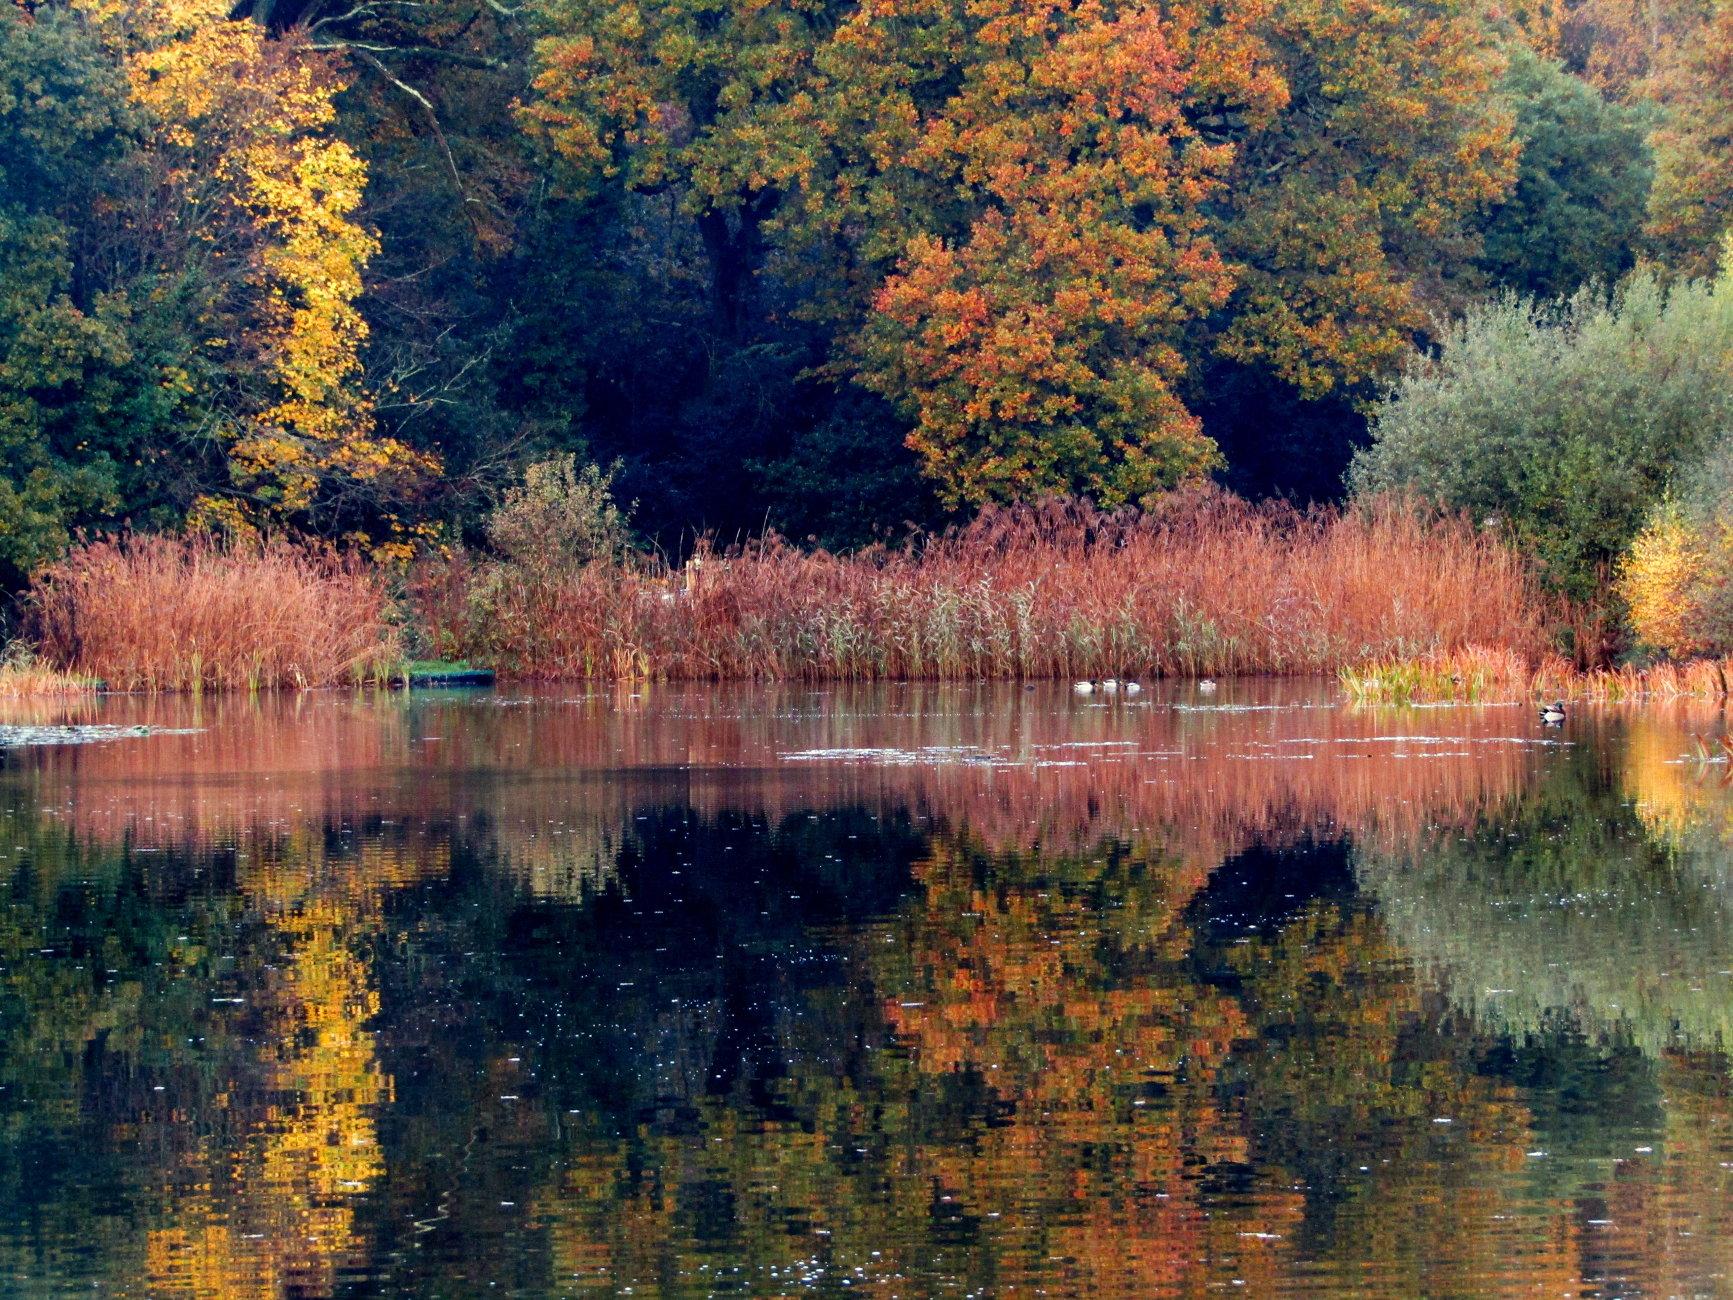 Autumnal paintbox